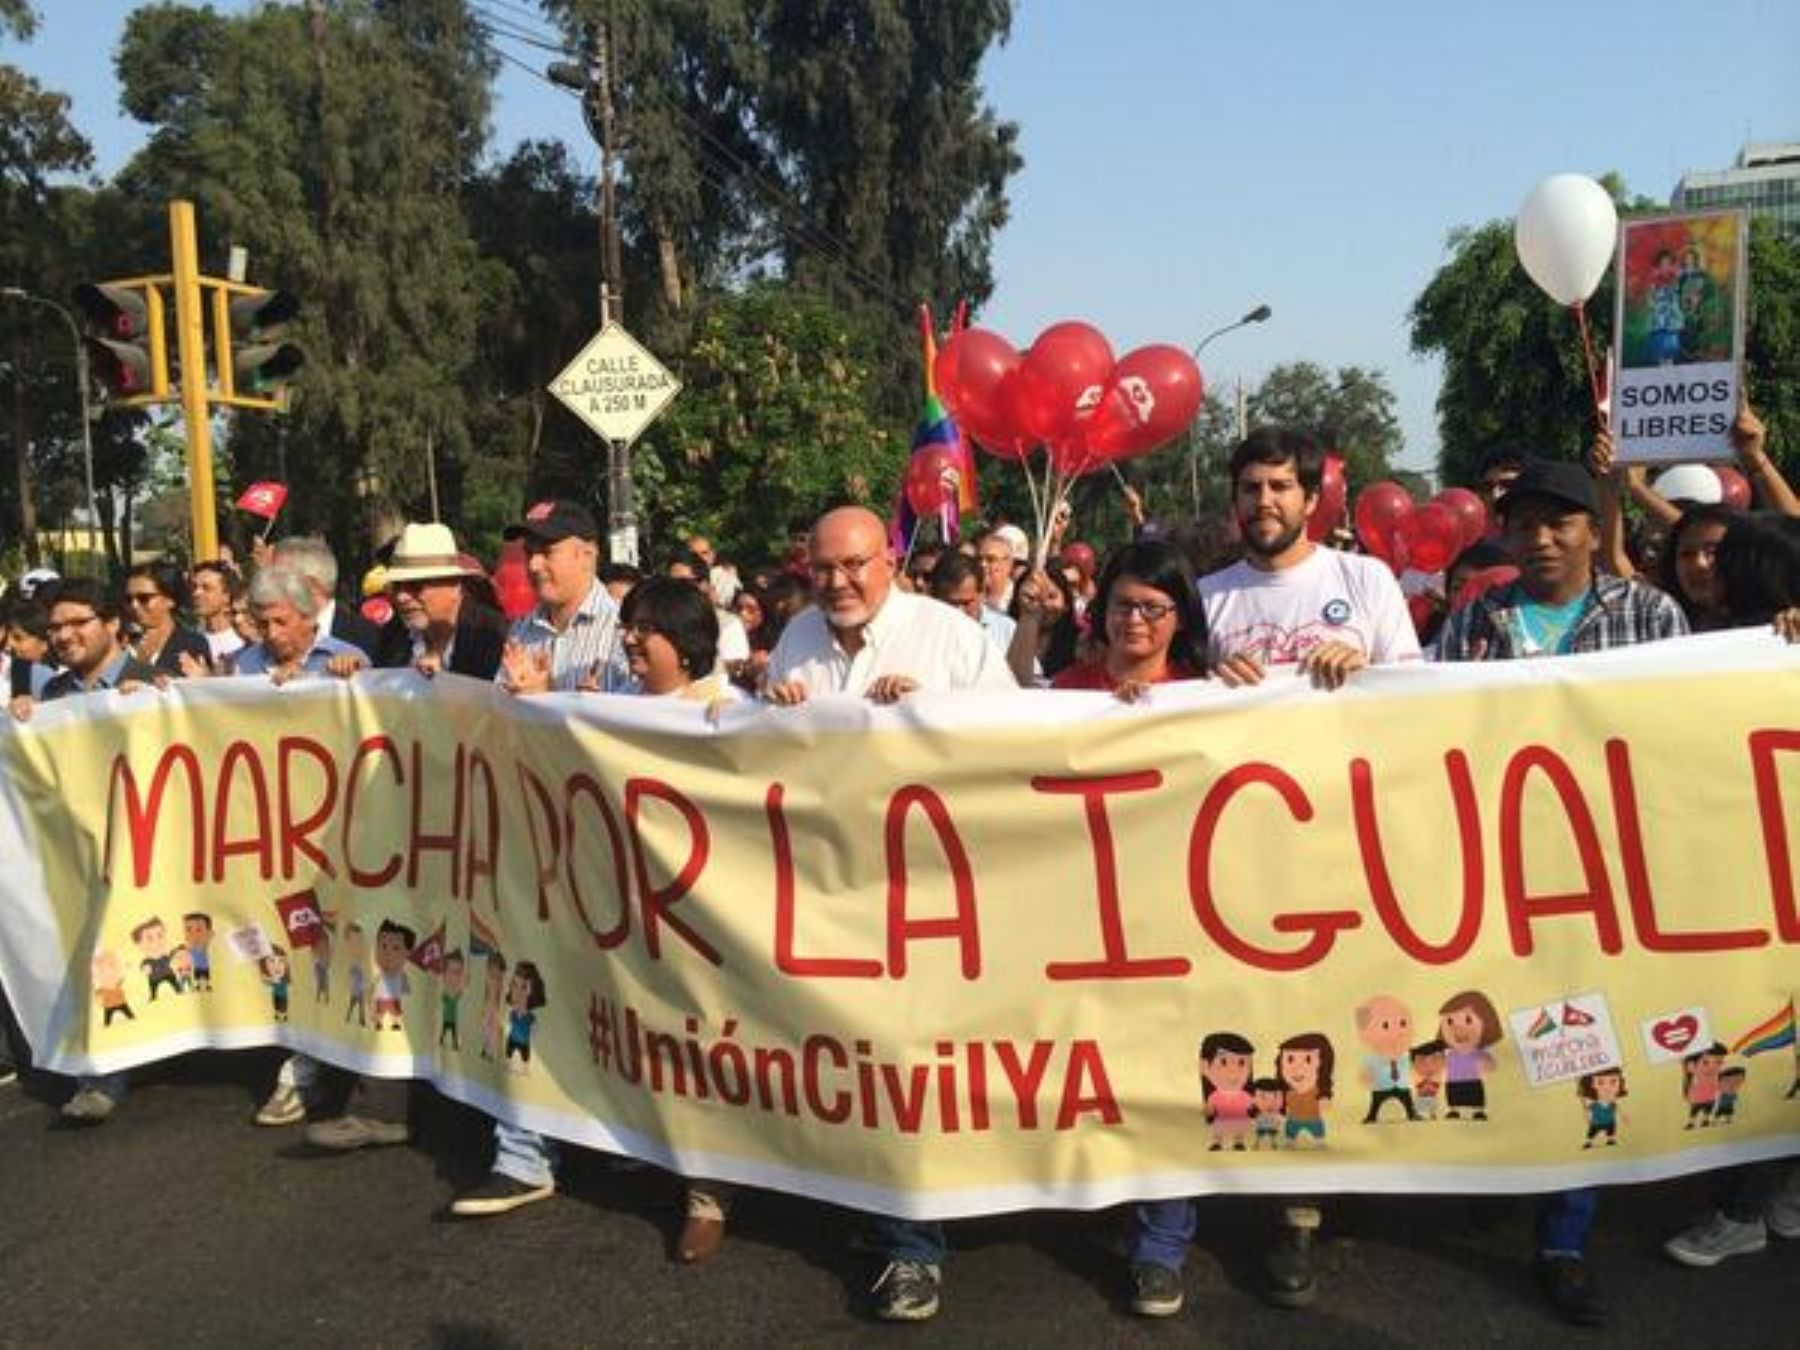 Marcha por Unión Civil recorre Centro de Lima. Foto: @esthervargasc